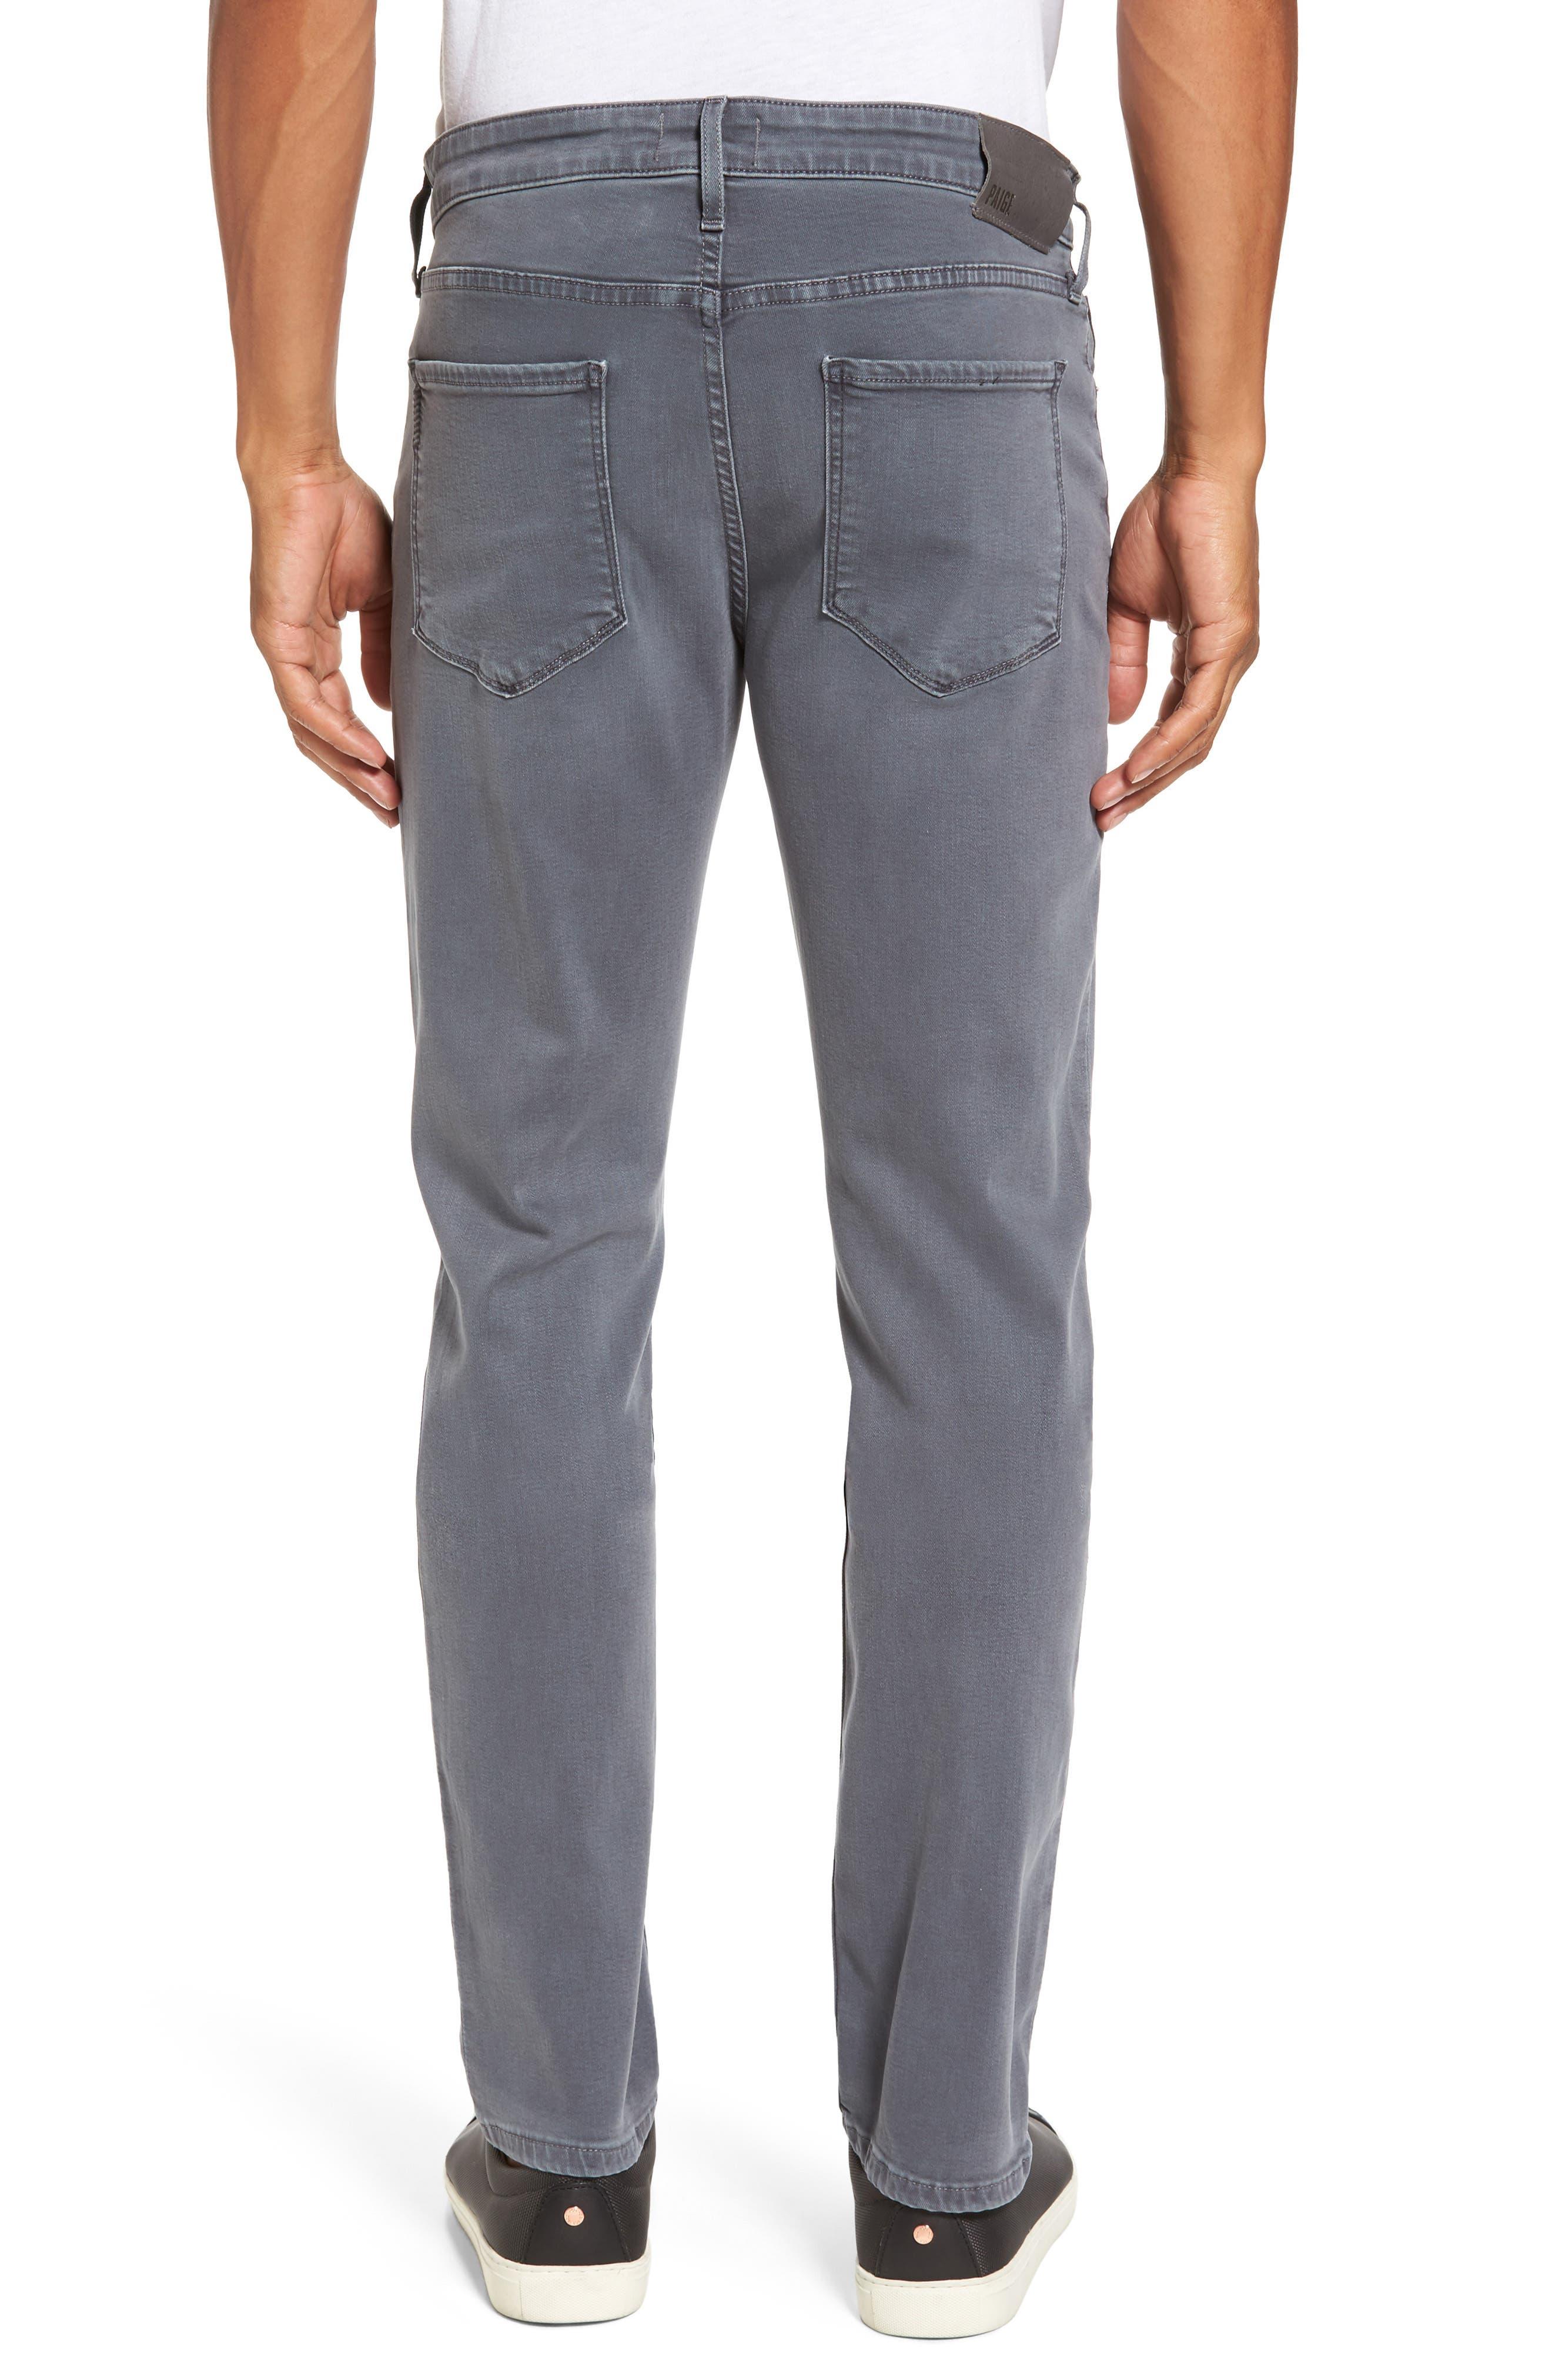 Lennox Slim Fit Jeans,                             Alternate thumbnail 2, color,